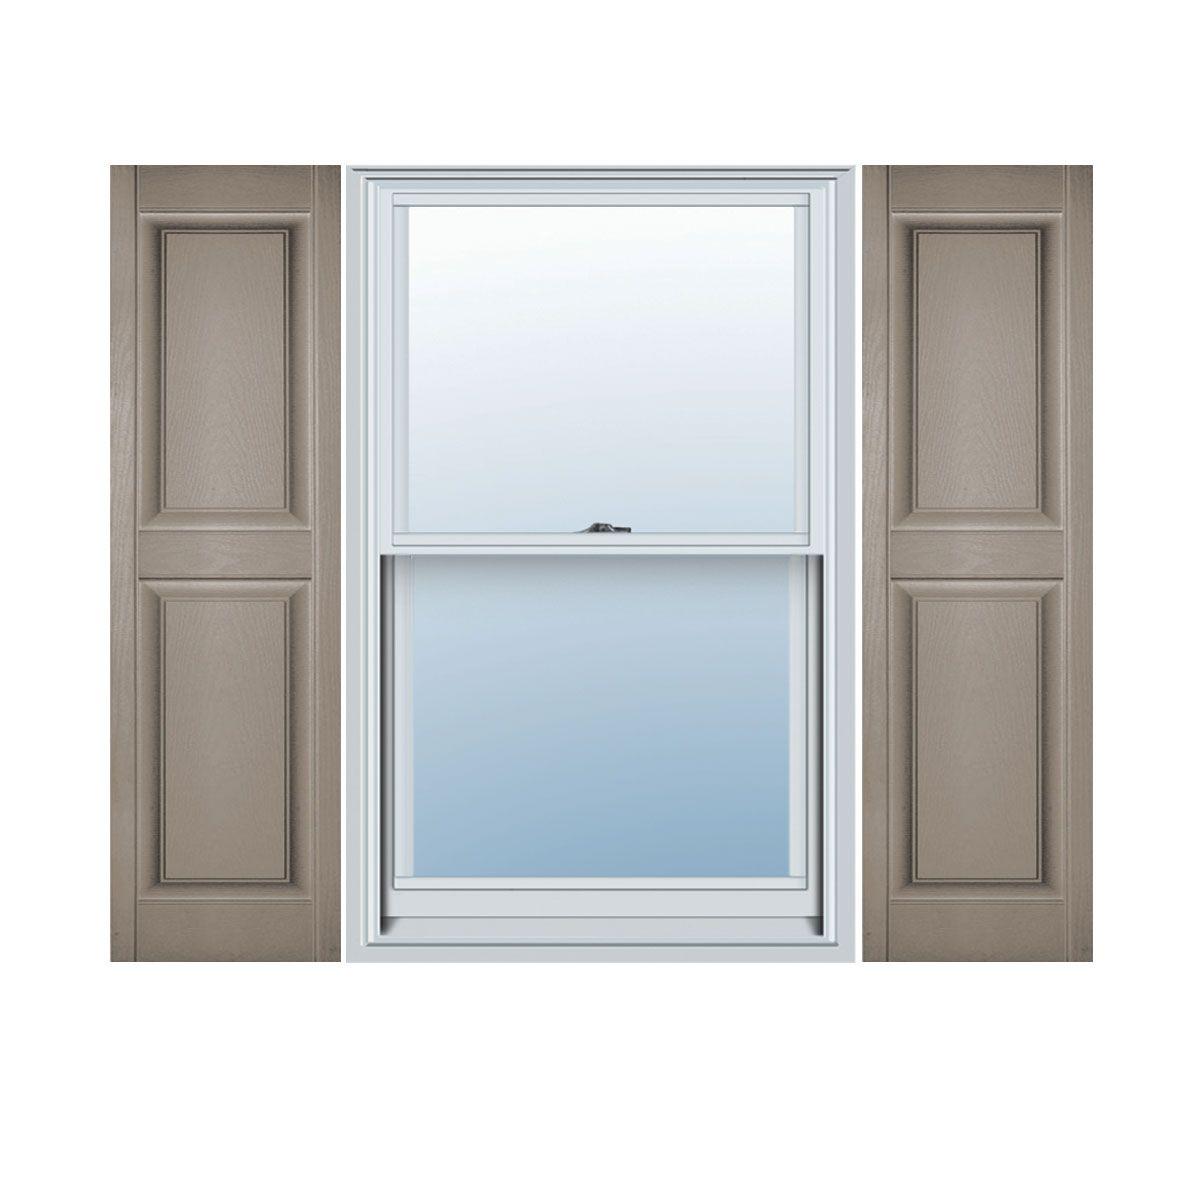 Custom Size Double Panel Vinyl Raised Panel Window Shutters, w/Shutter-Loks (Per Pair) - 0